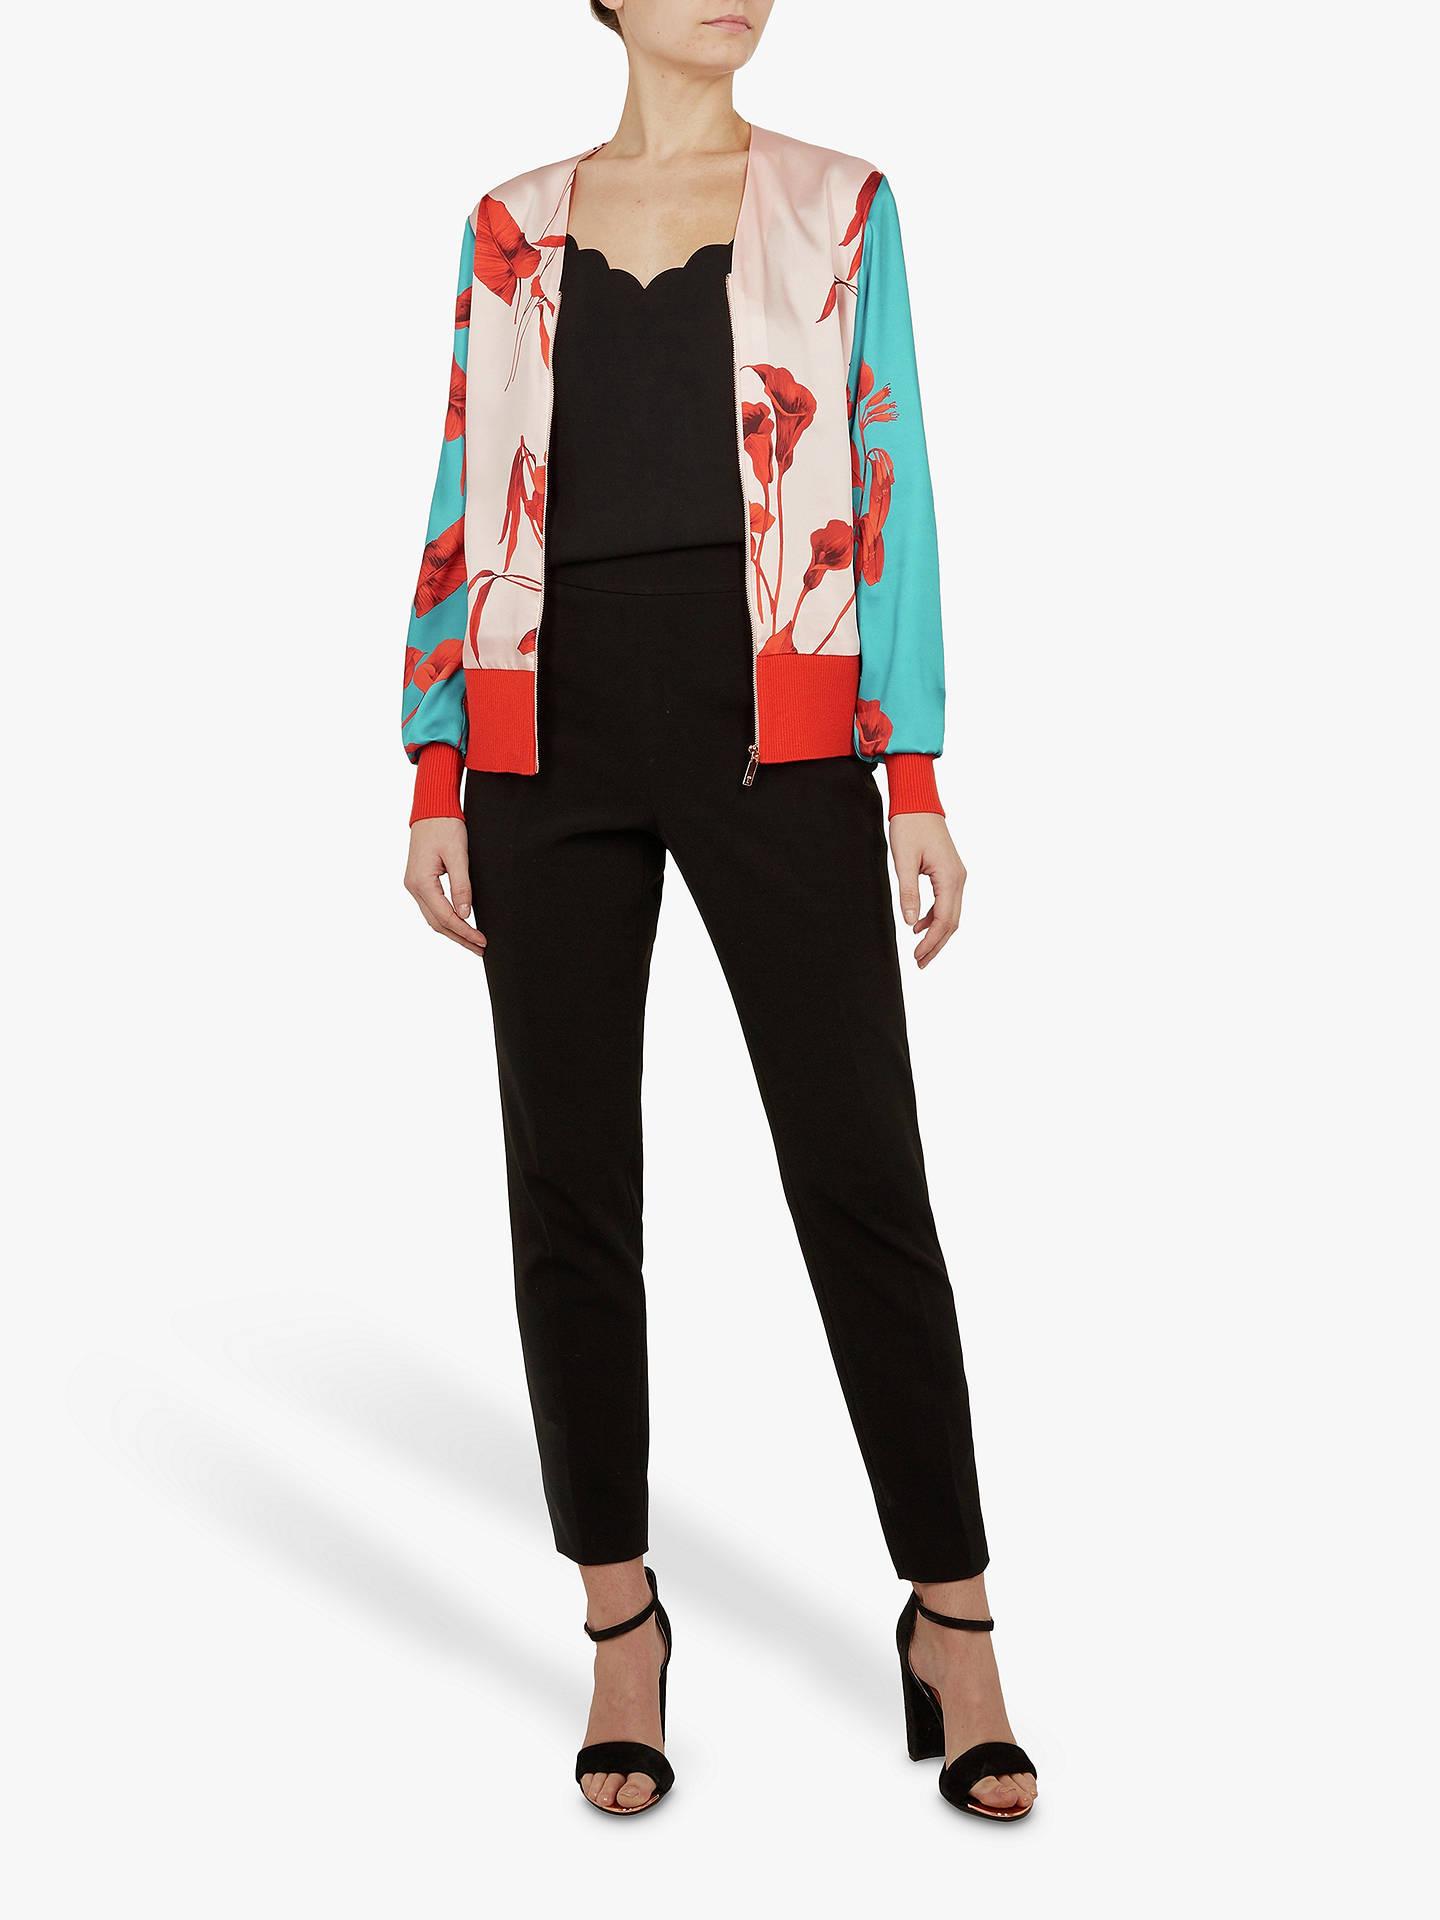 aa65fe6cd ... Buy Ted Baker Cortnee Fantasia Knit Bomber Jacket